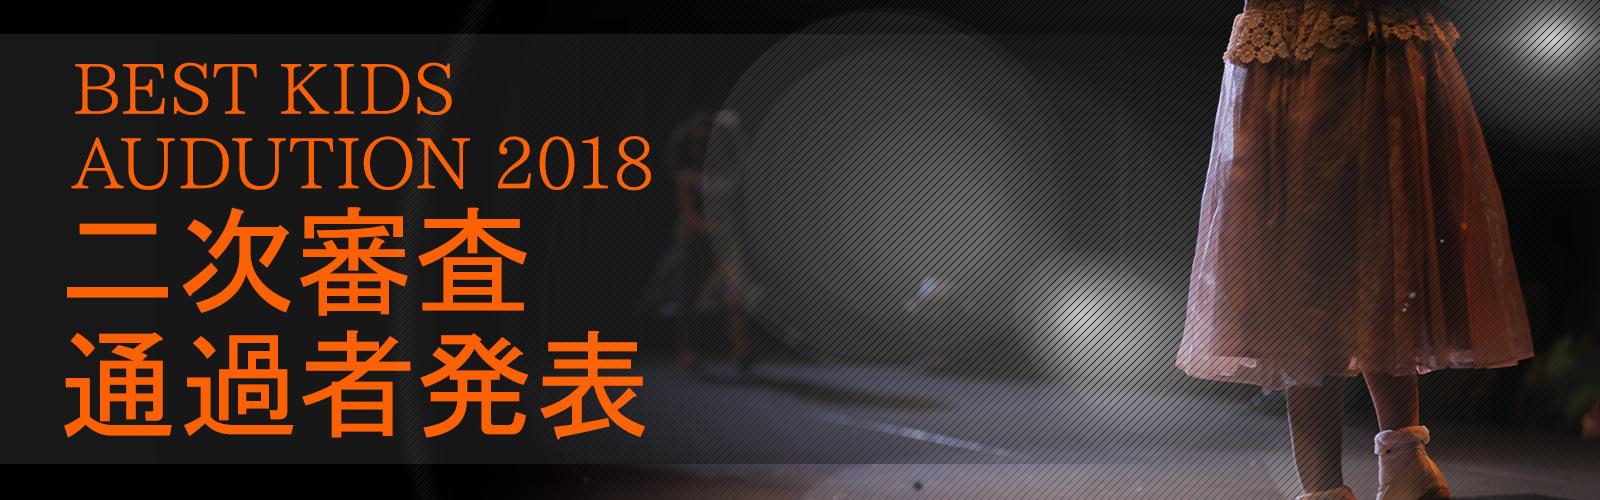 BEST KIDS AWARDS 2018 二次審査通過者発表